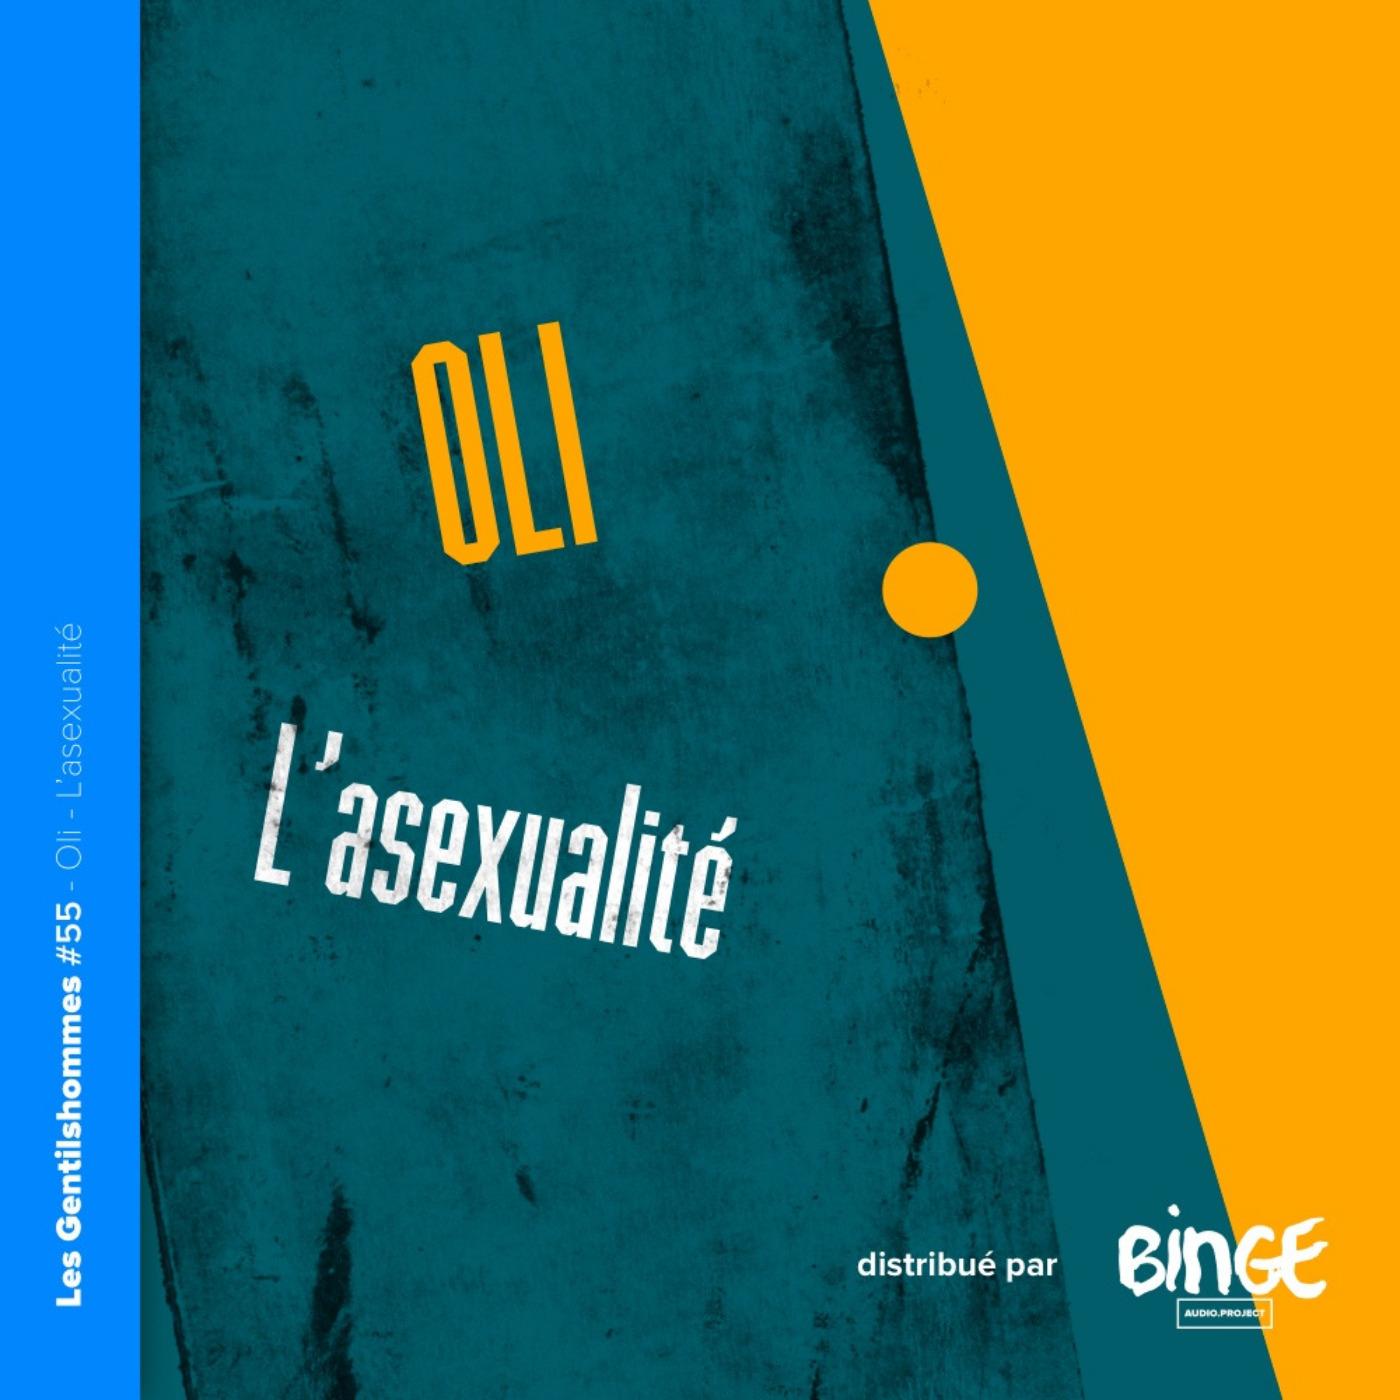 Oli – L'asexualité